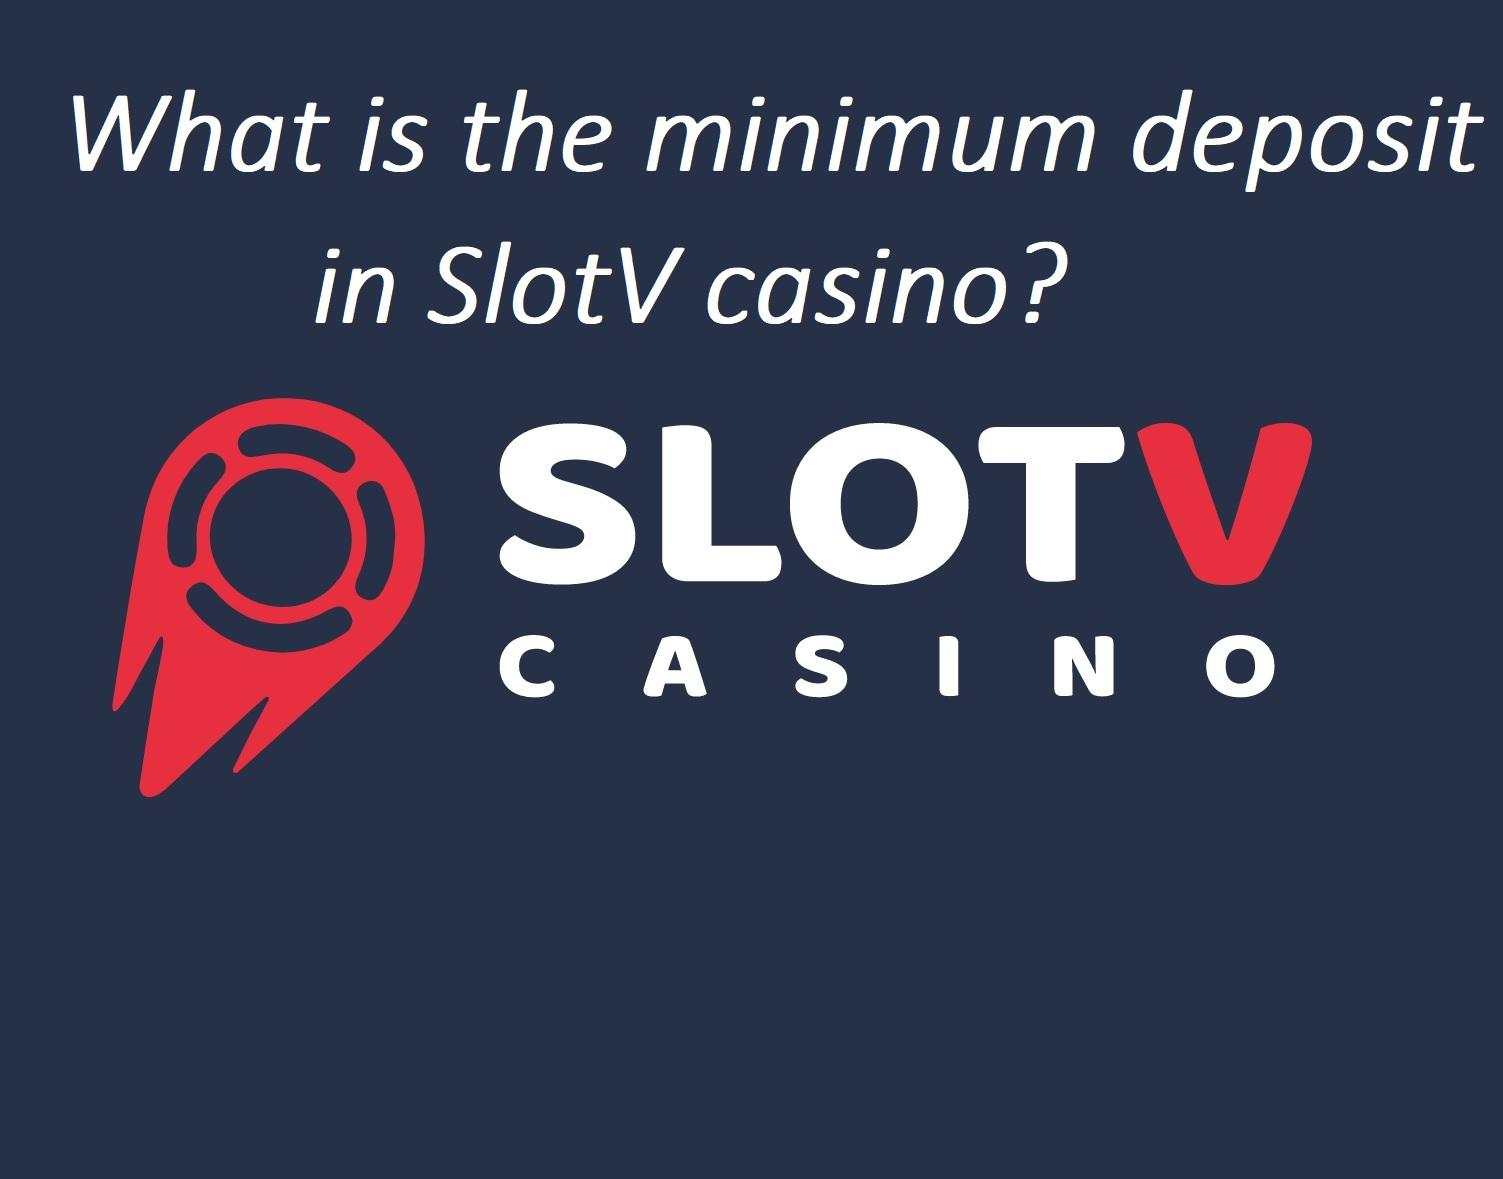 What is the minimum deposit amount in Slot V casino